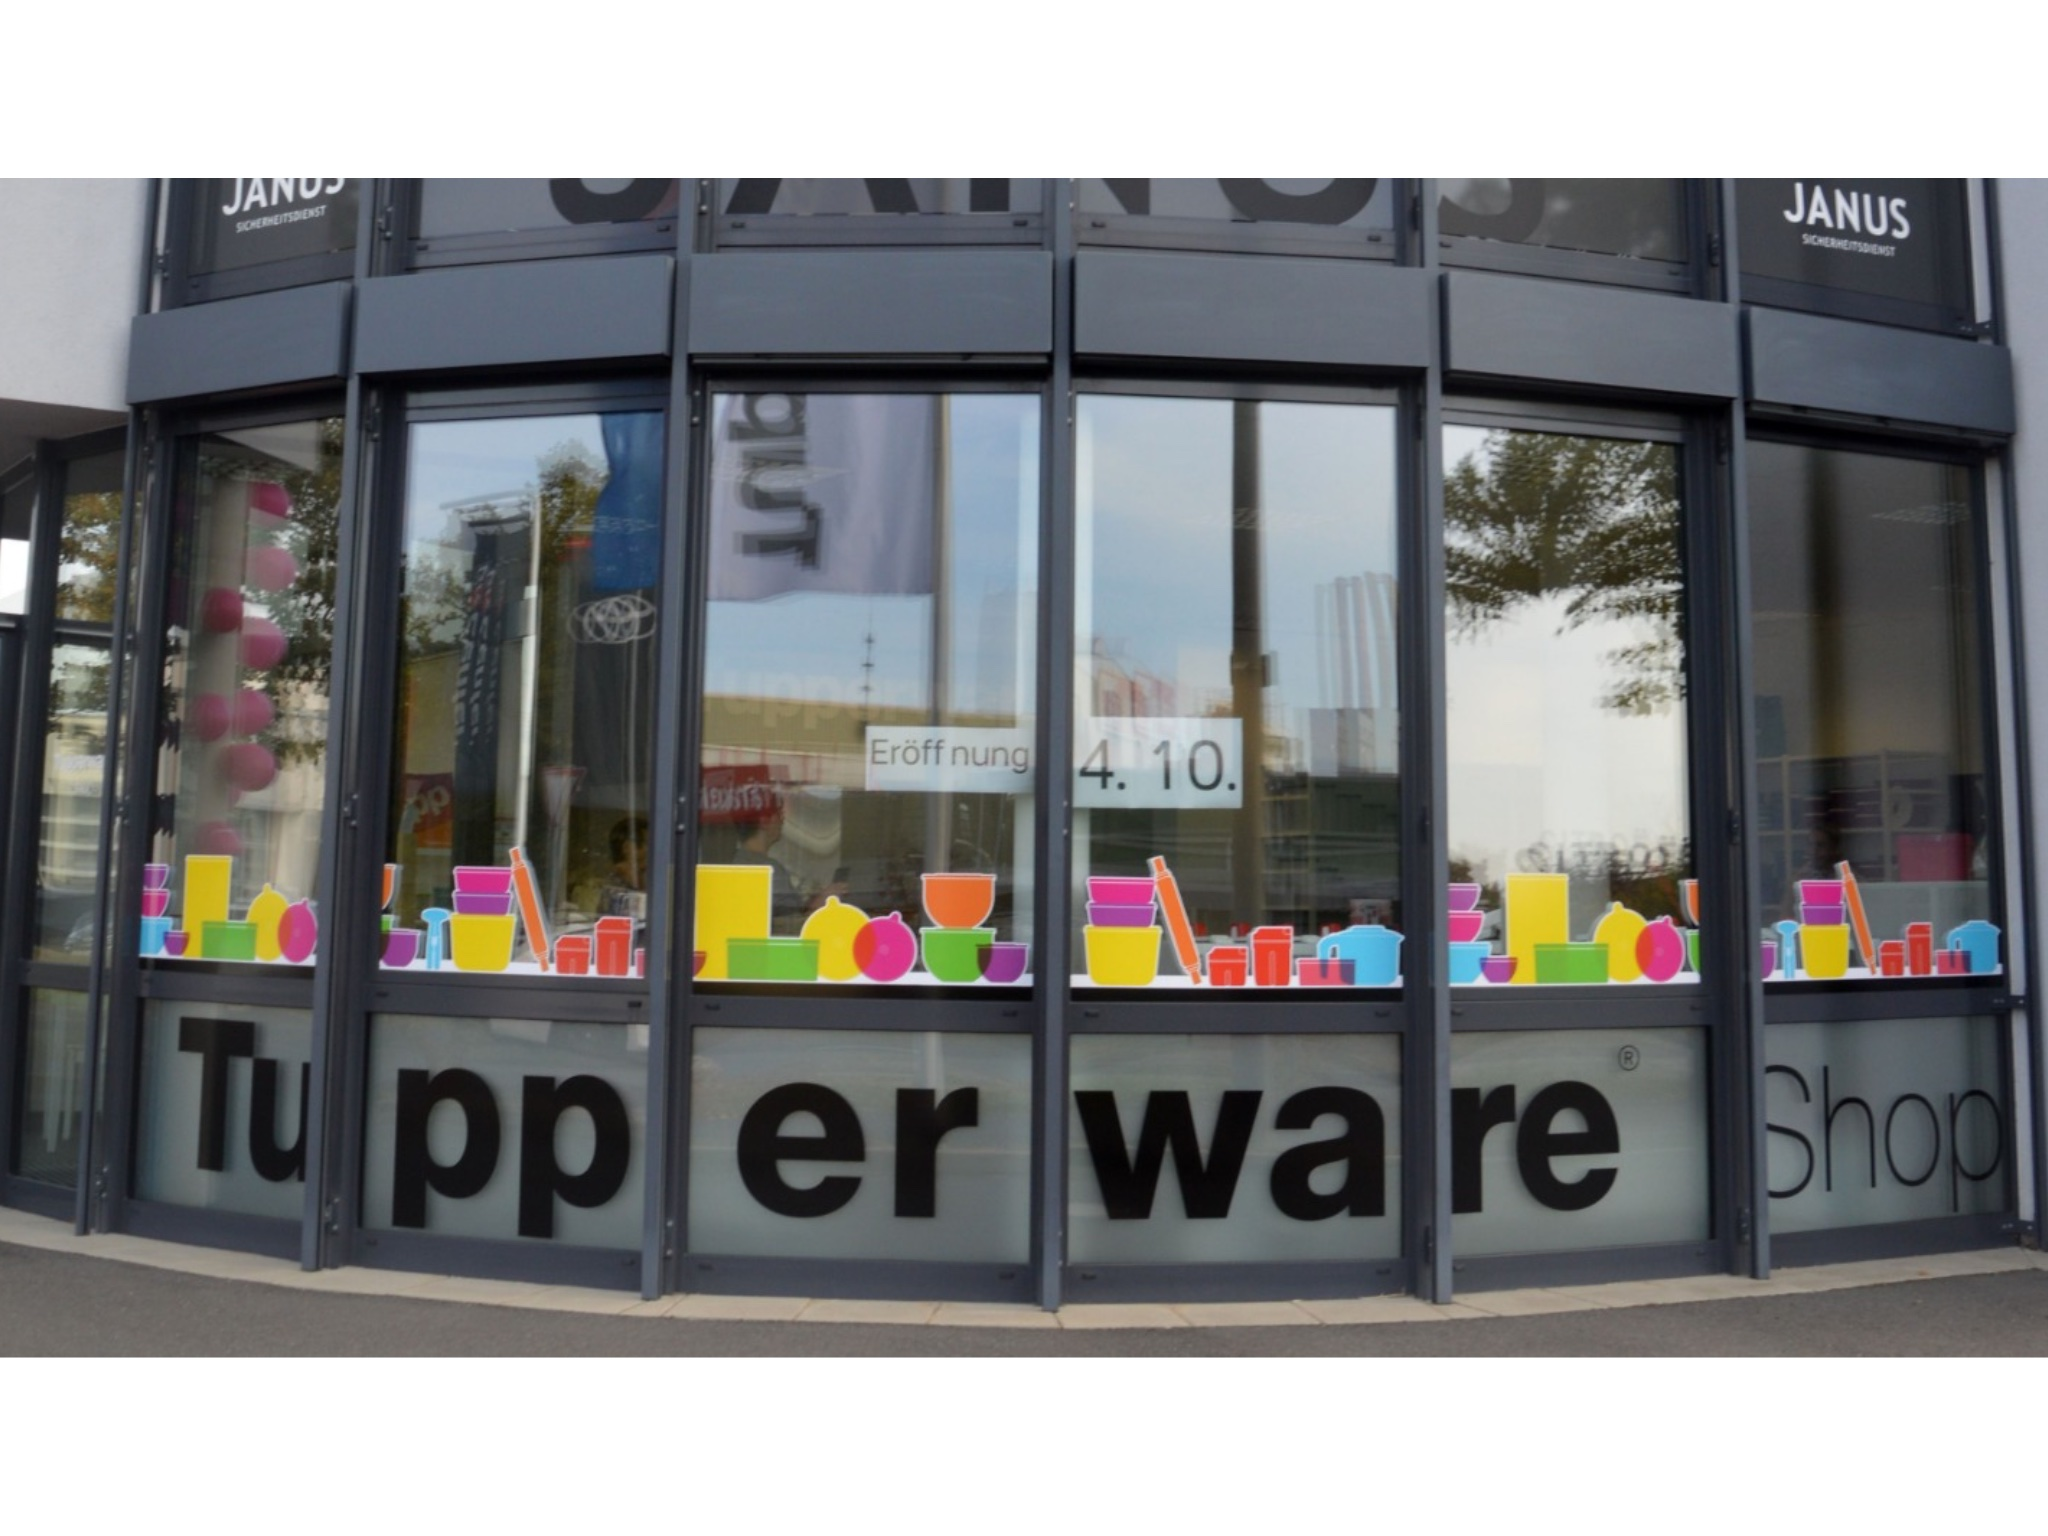 Der Tupperware-Shop in der Nürnberger Straße 123. Foto: Joachim Wenk